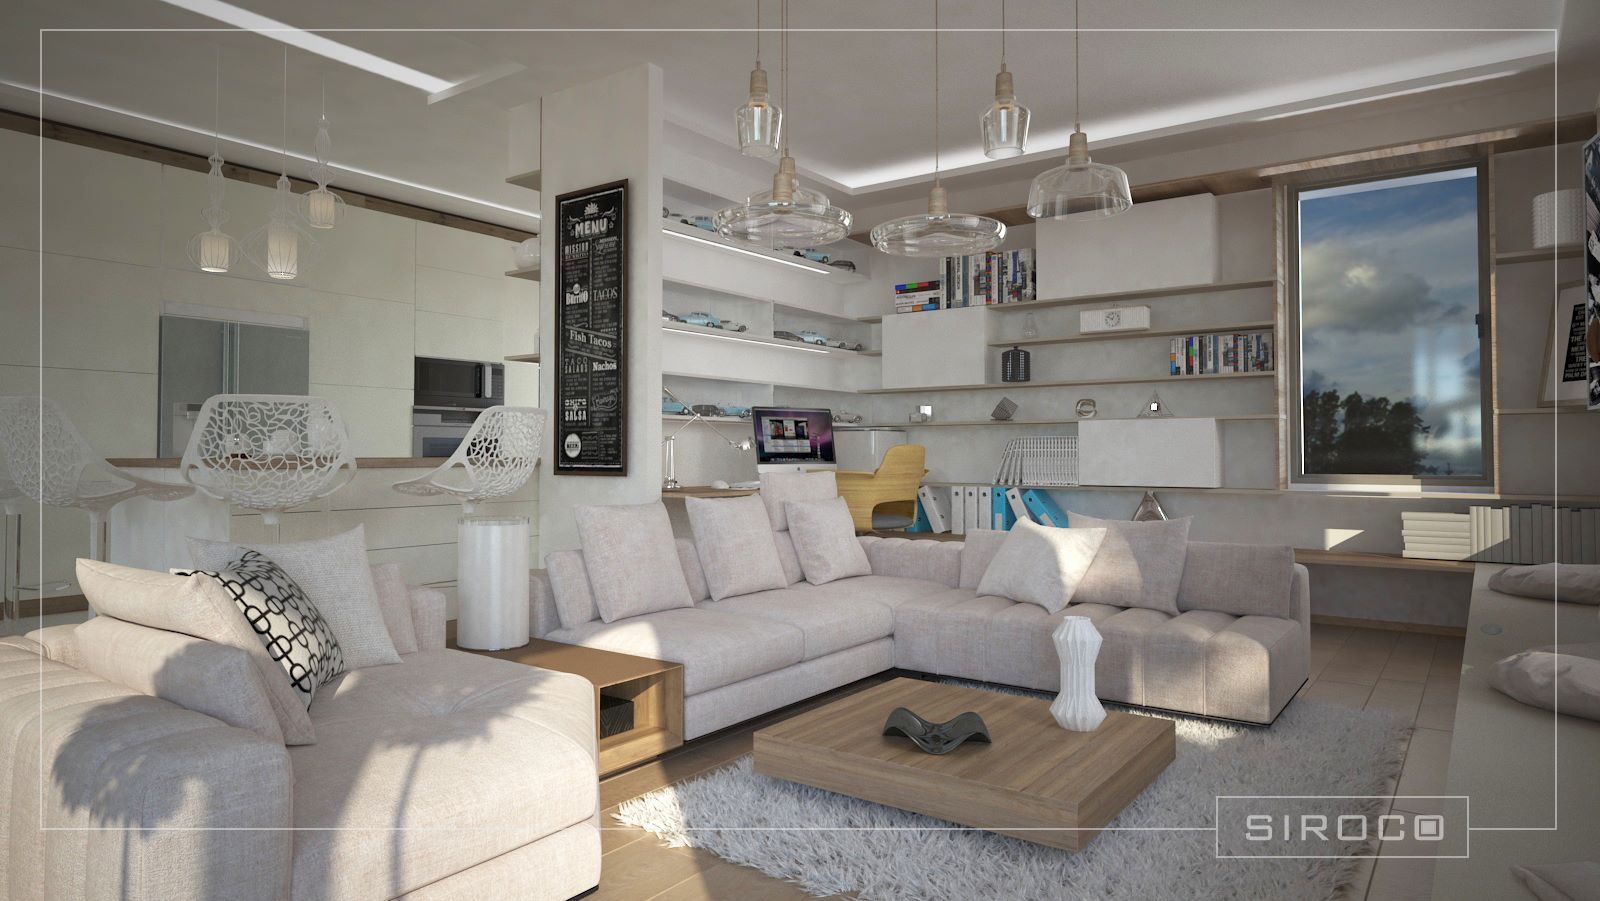 design-software-archlinexp-livingroom-view